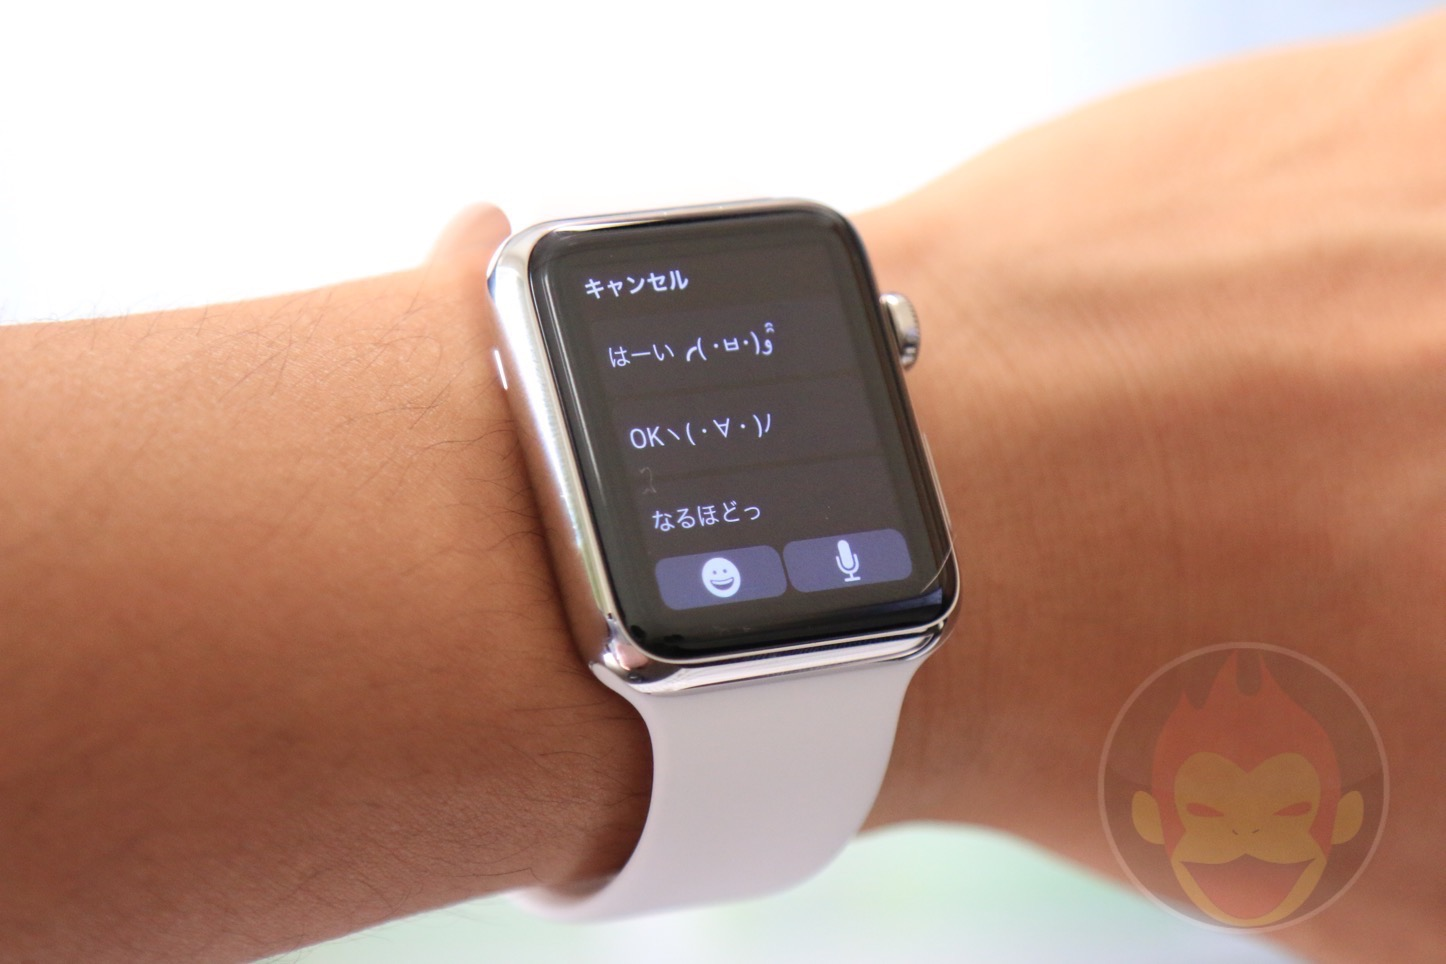 Apple-Watch-Usage-Review-001.JPG